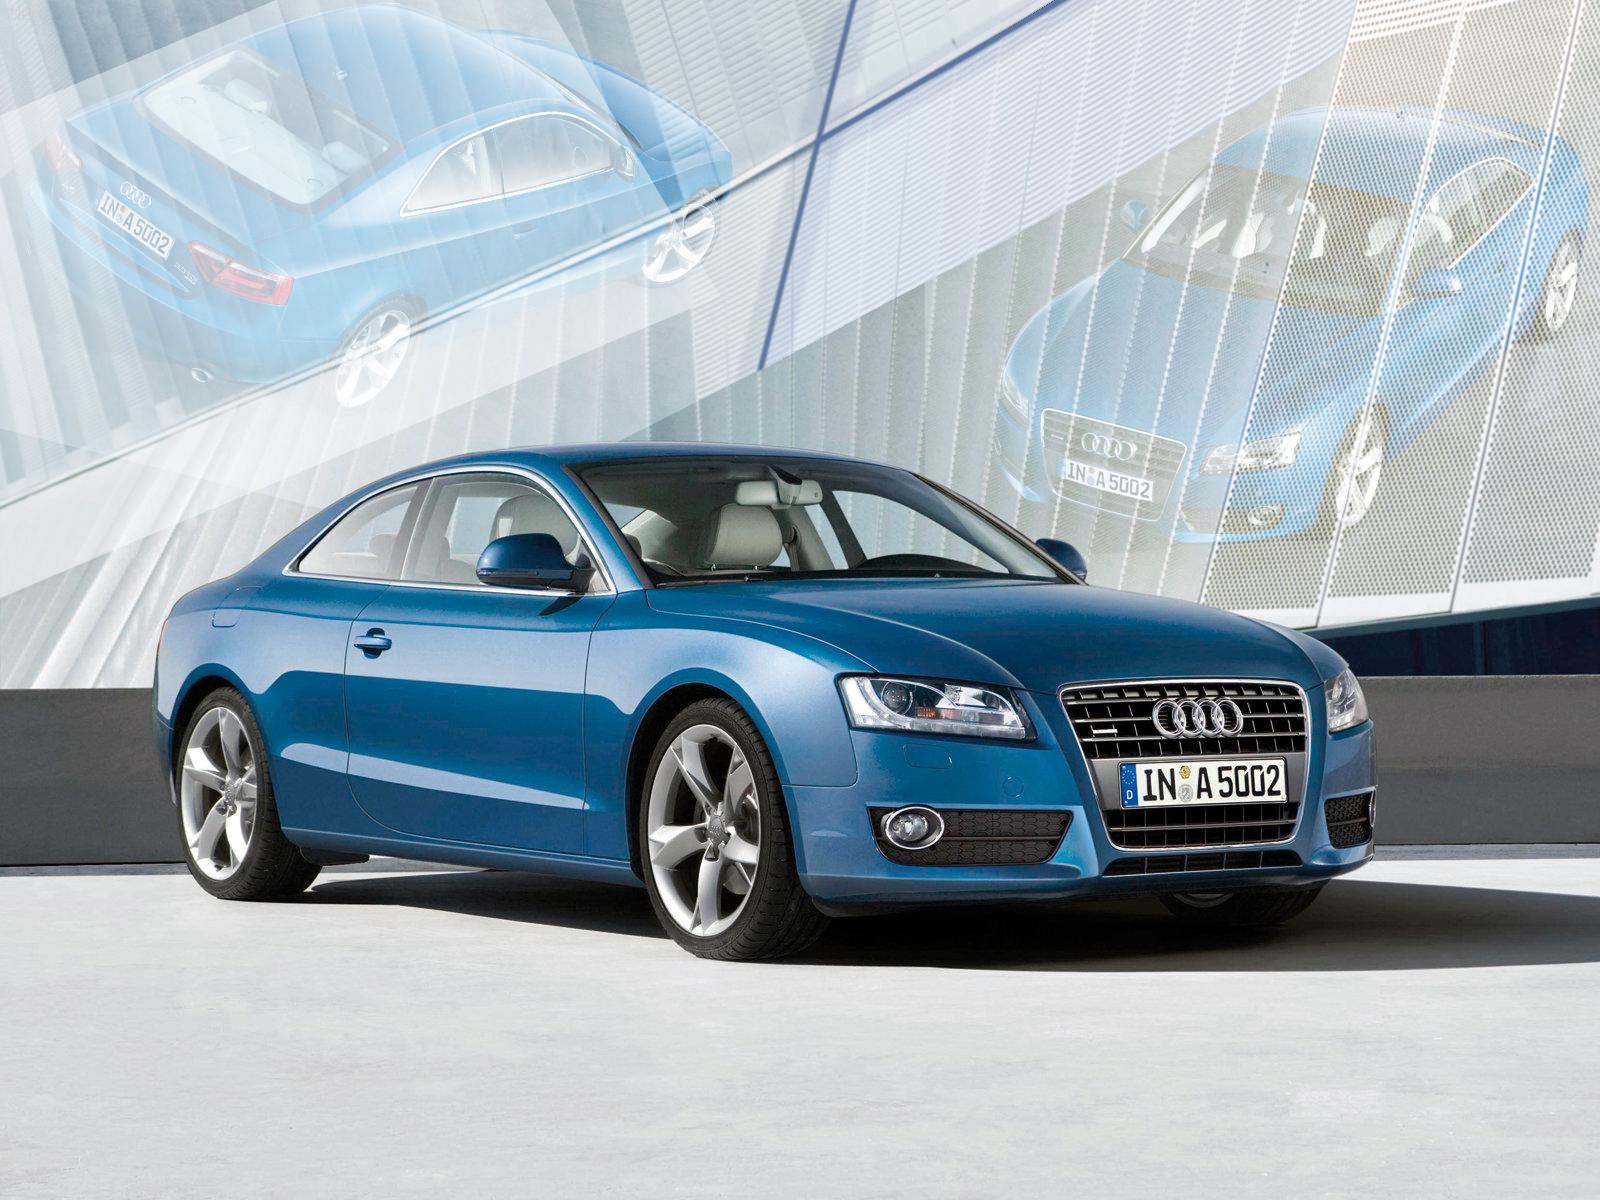 Audi A5 2008 1600-1200 wallpaper by ARIX-1-